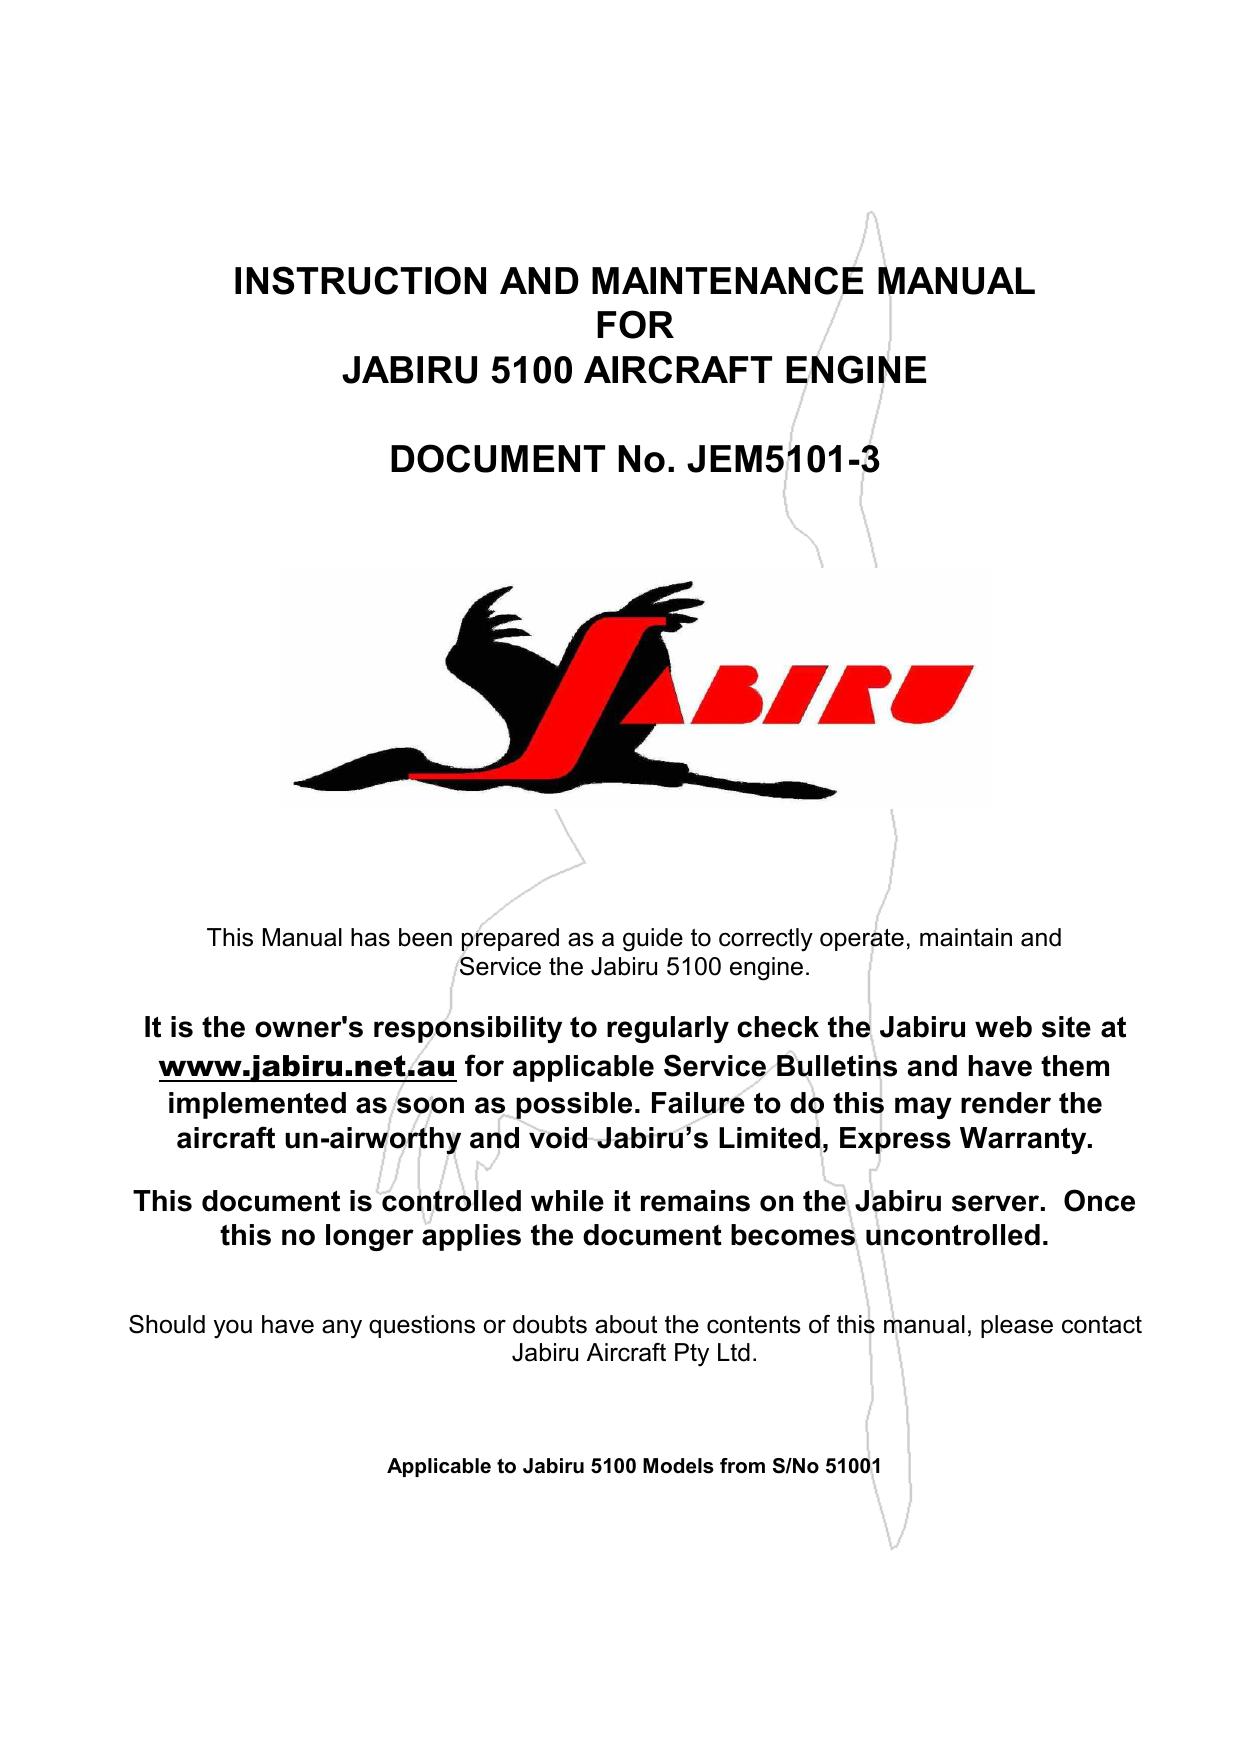 INSTRUCTION AND MAINTENANCE MANUAL FOR | manualzz com